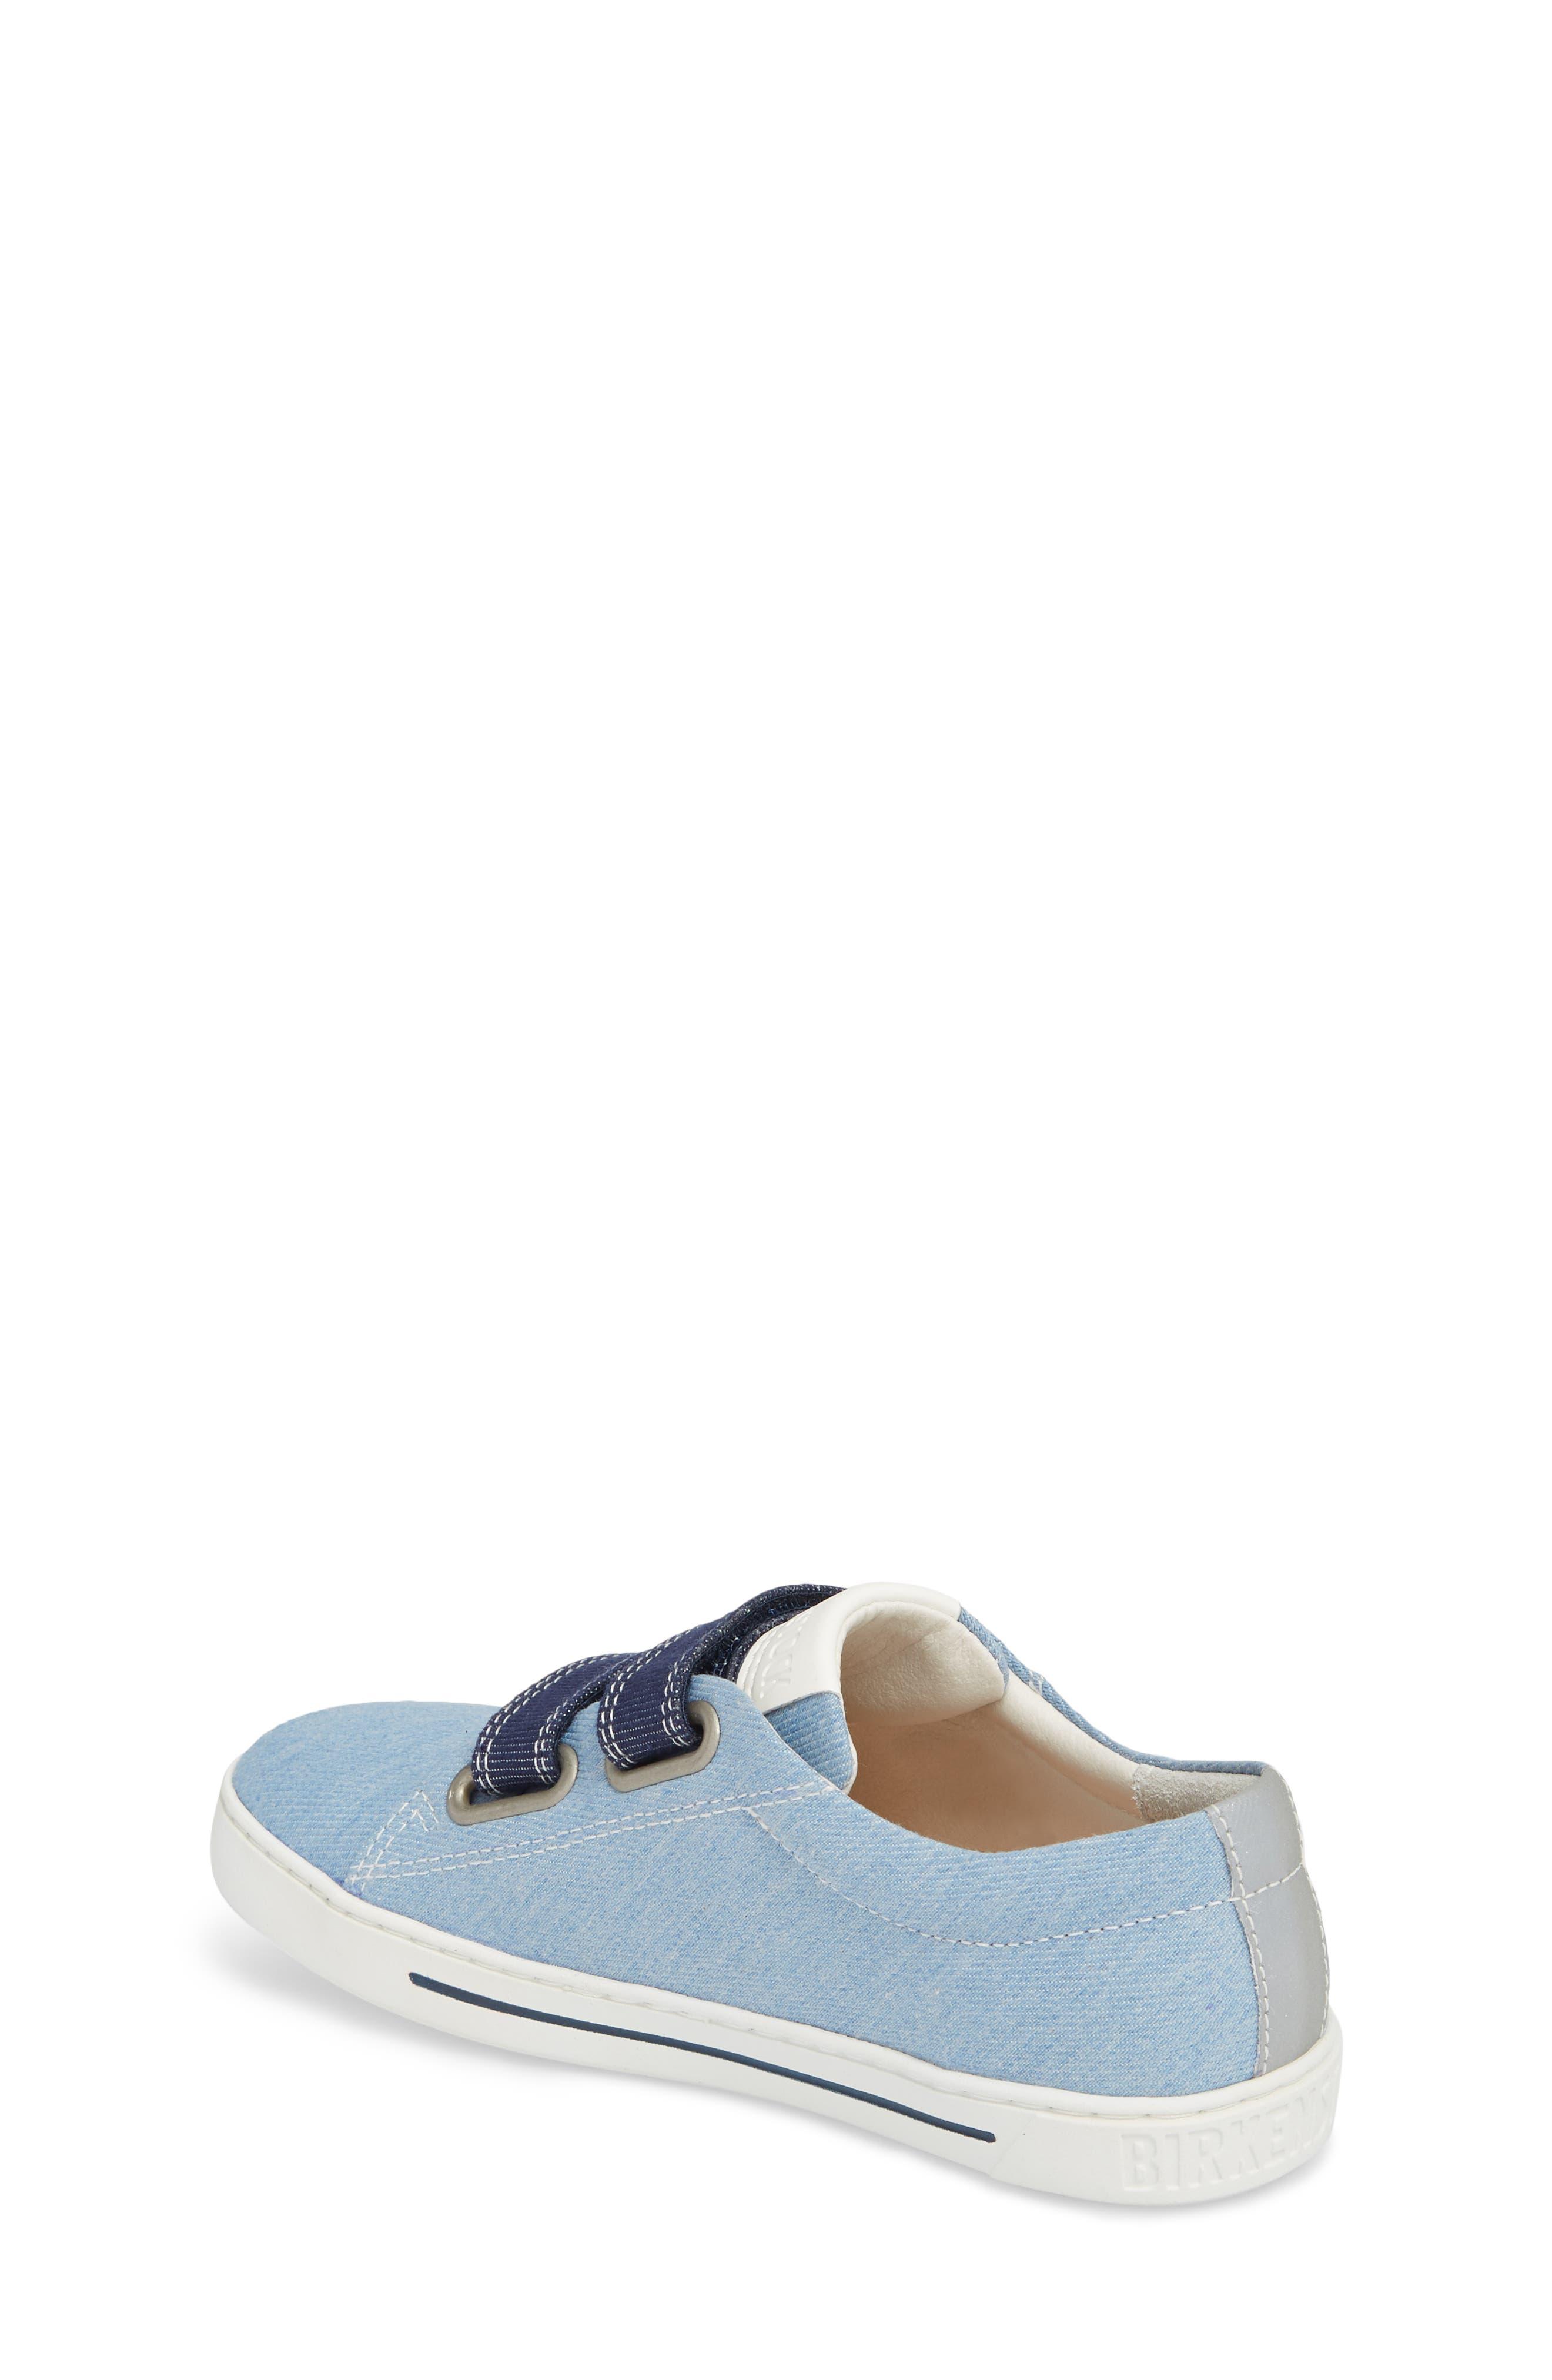 Alternate Image 2  - Birkenstock Arran Sneaker (Toddler & Little Kid)